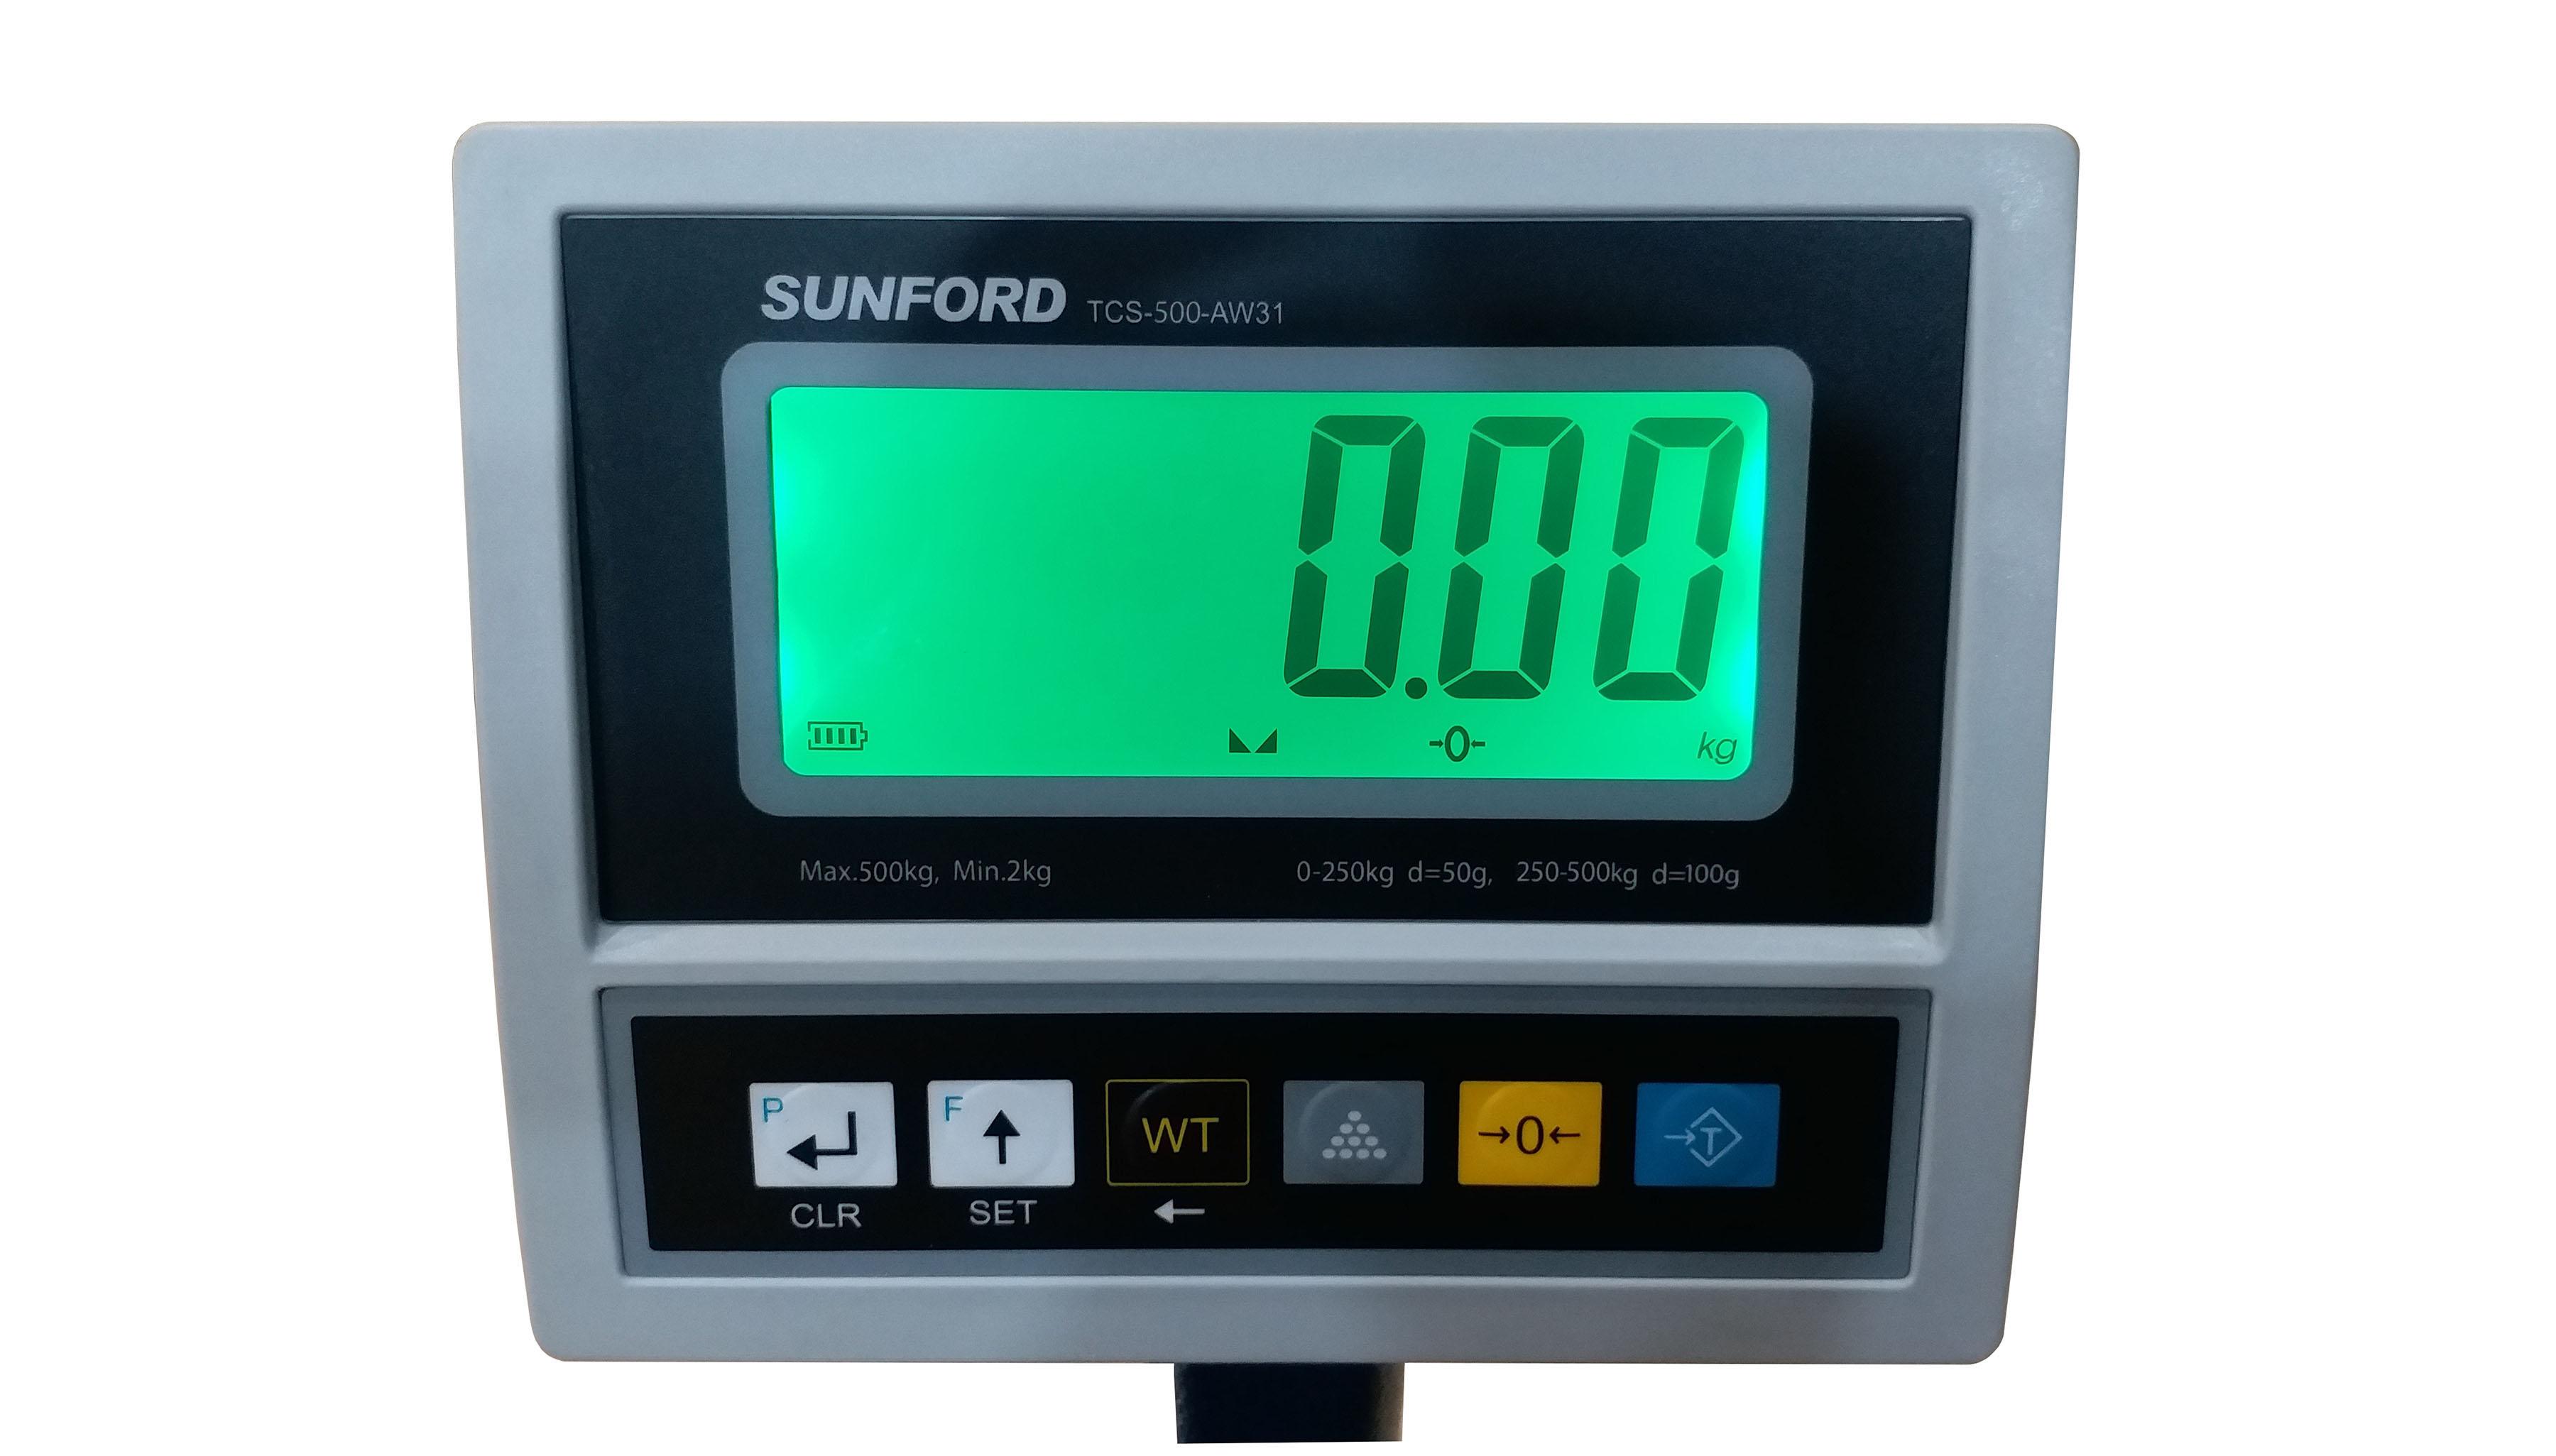 SUNFORD TCS-500-AW31